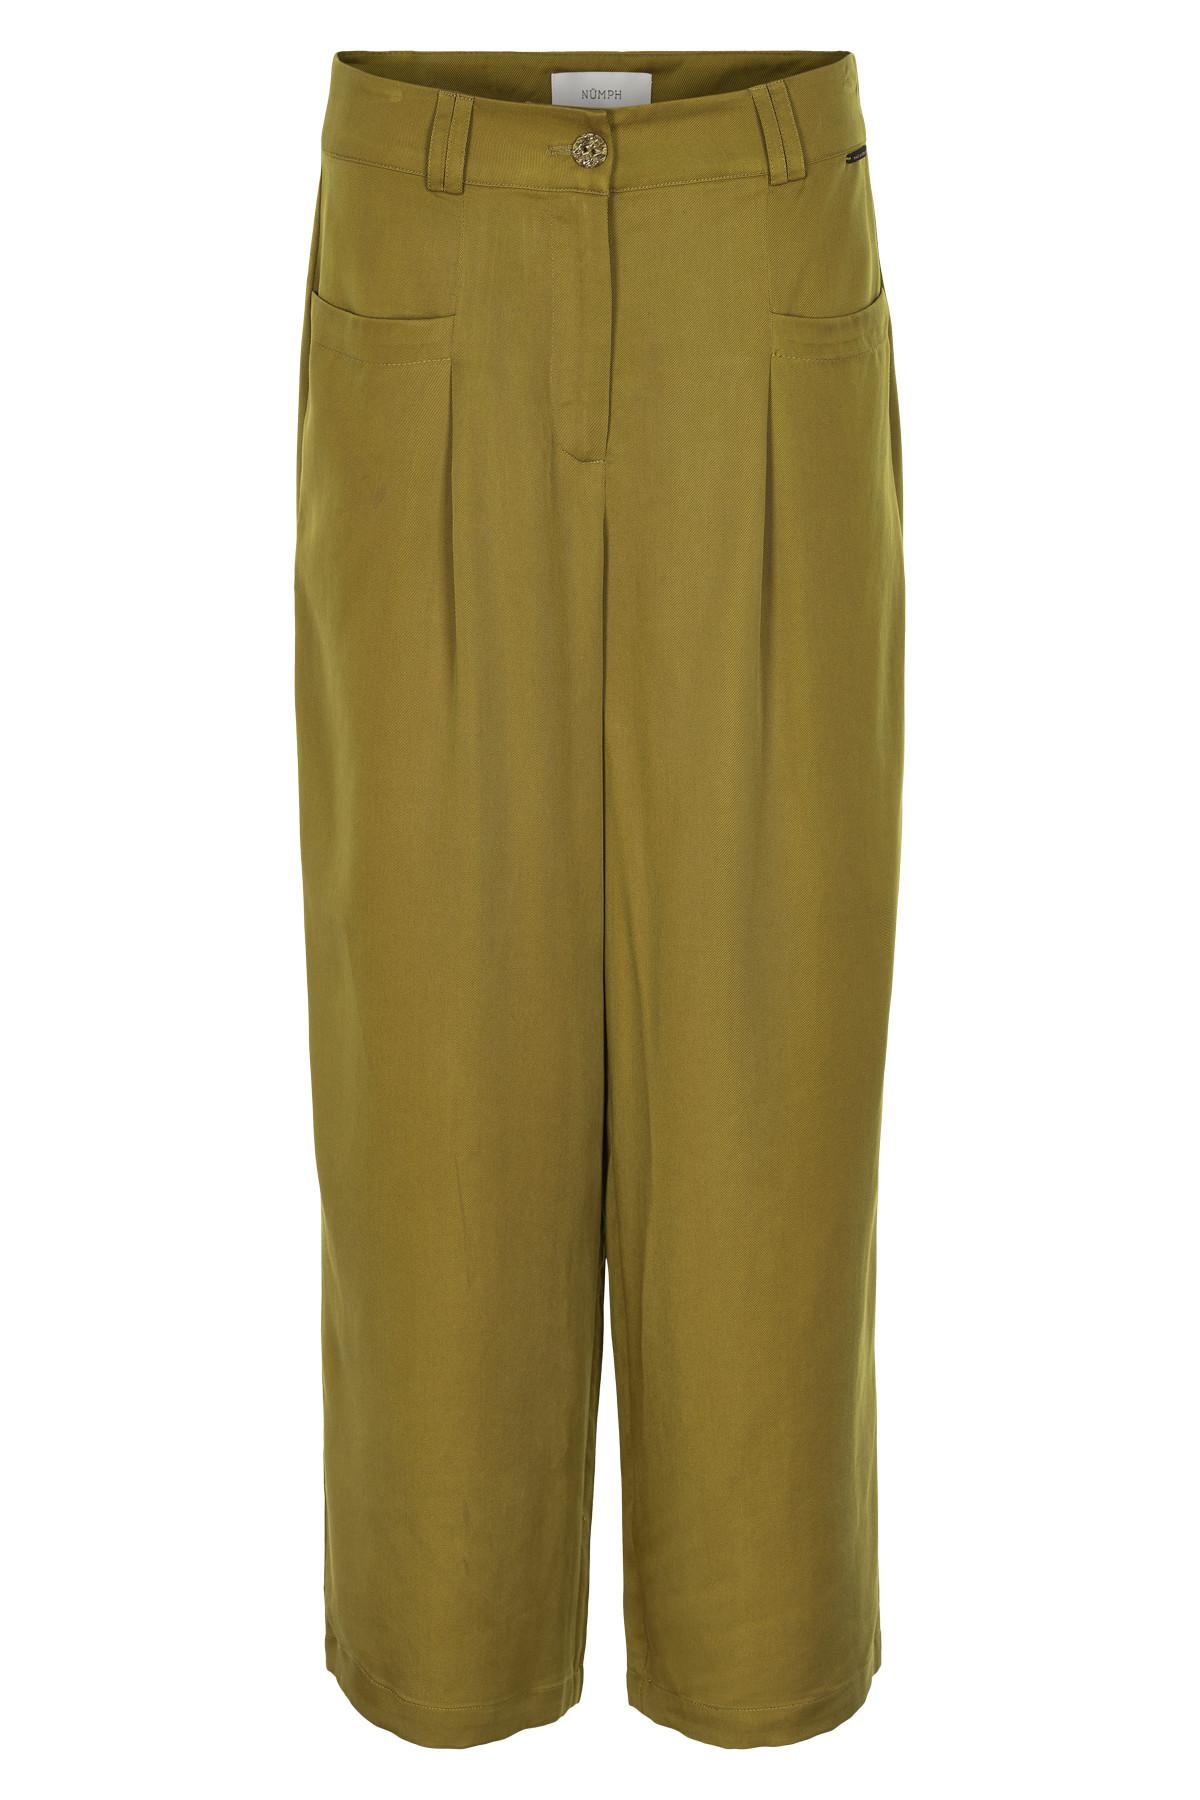 cream bukser lily pants, cream port royale celina bluse